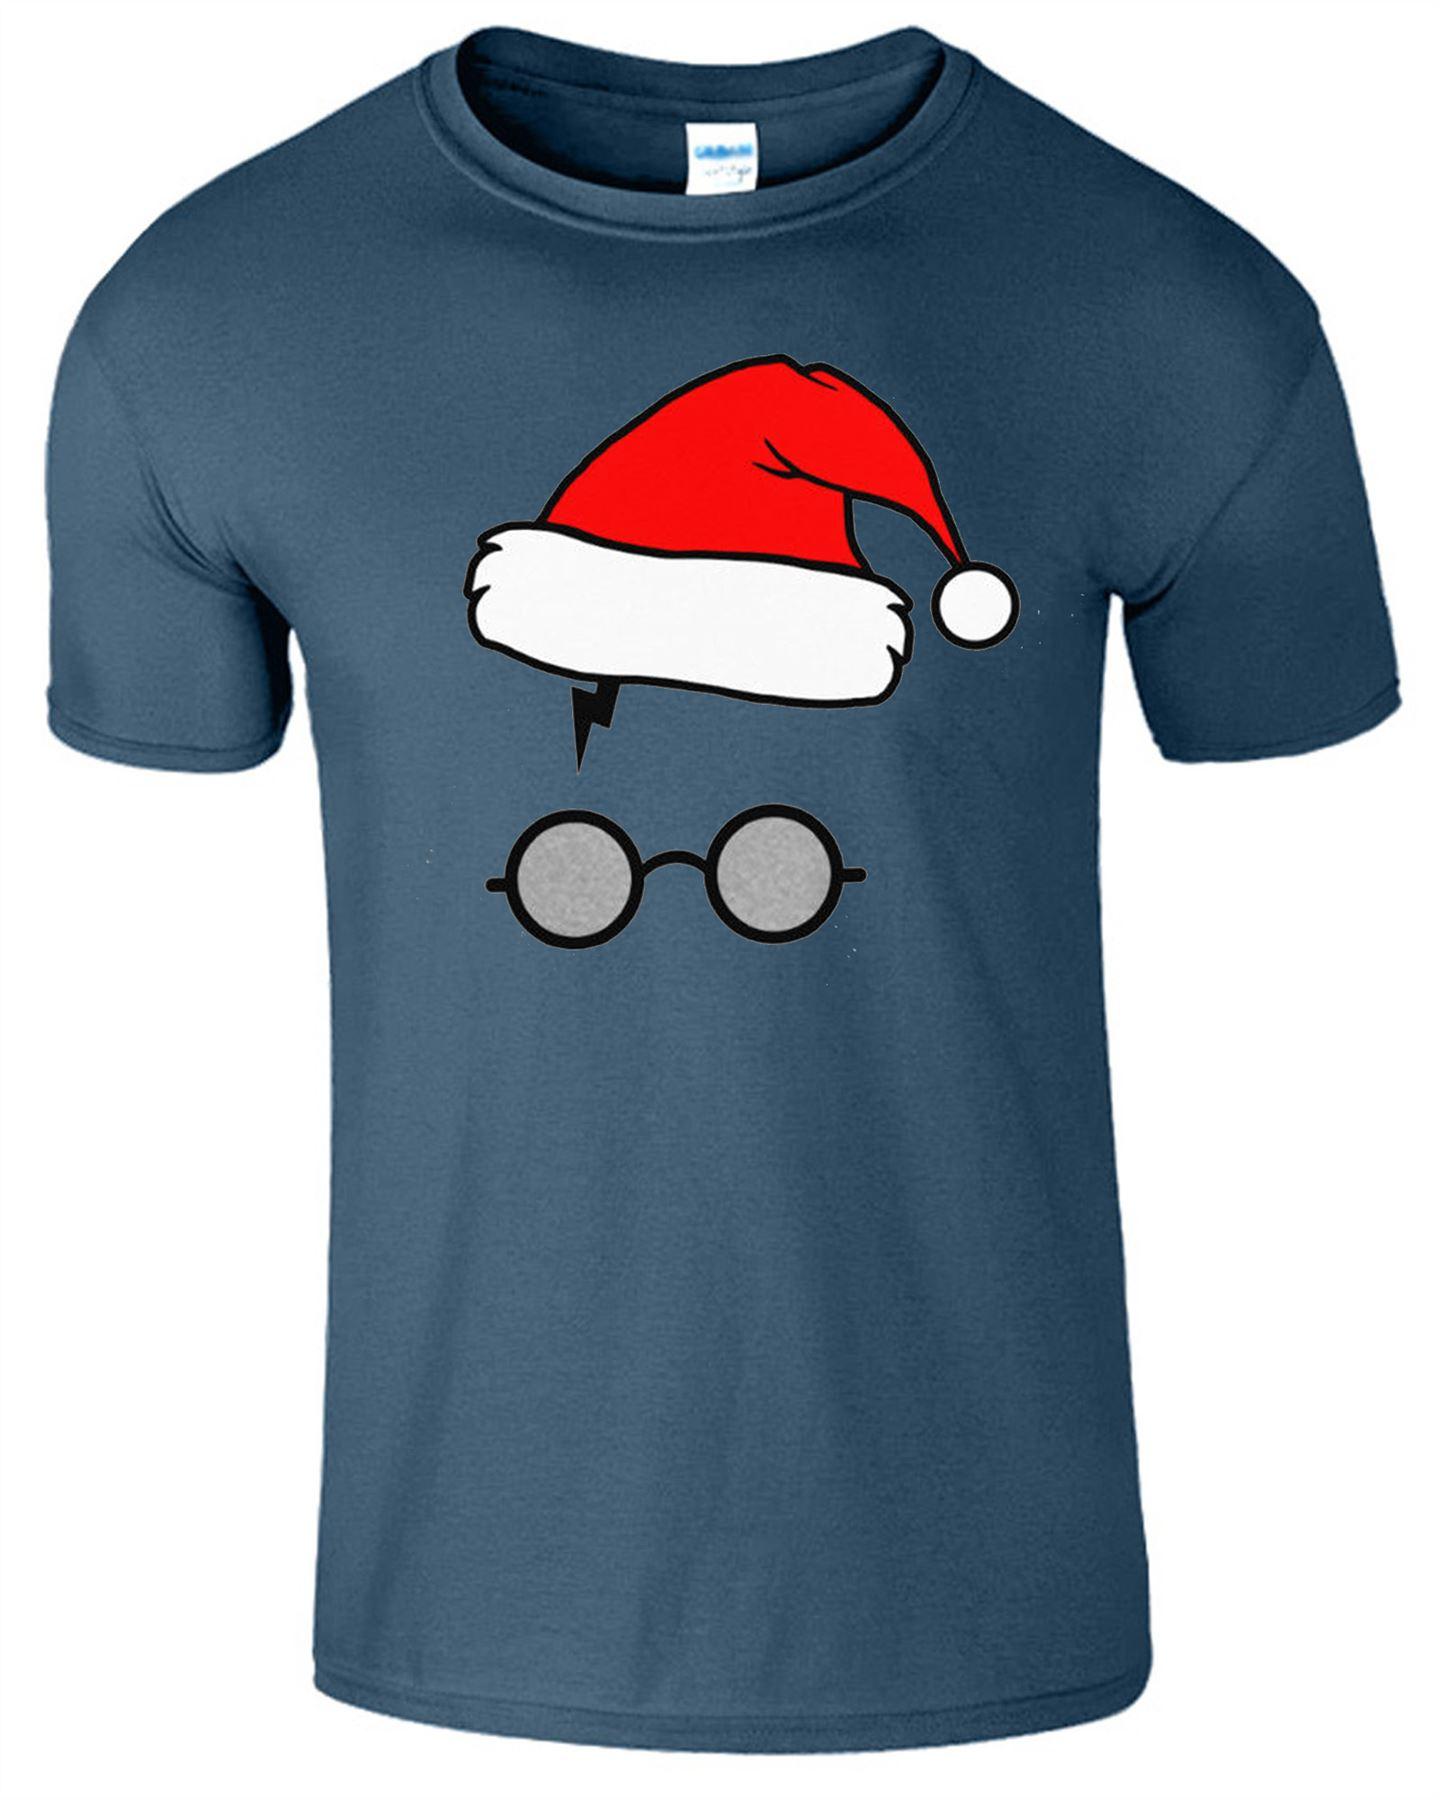 Harry Potter Glasses Santa Hat Tshirt Christmas Festive Present Gift Tee T shirt